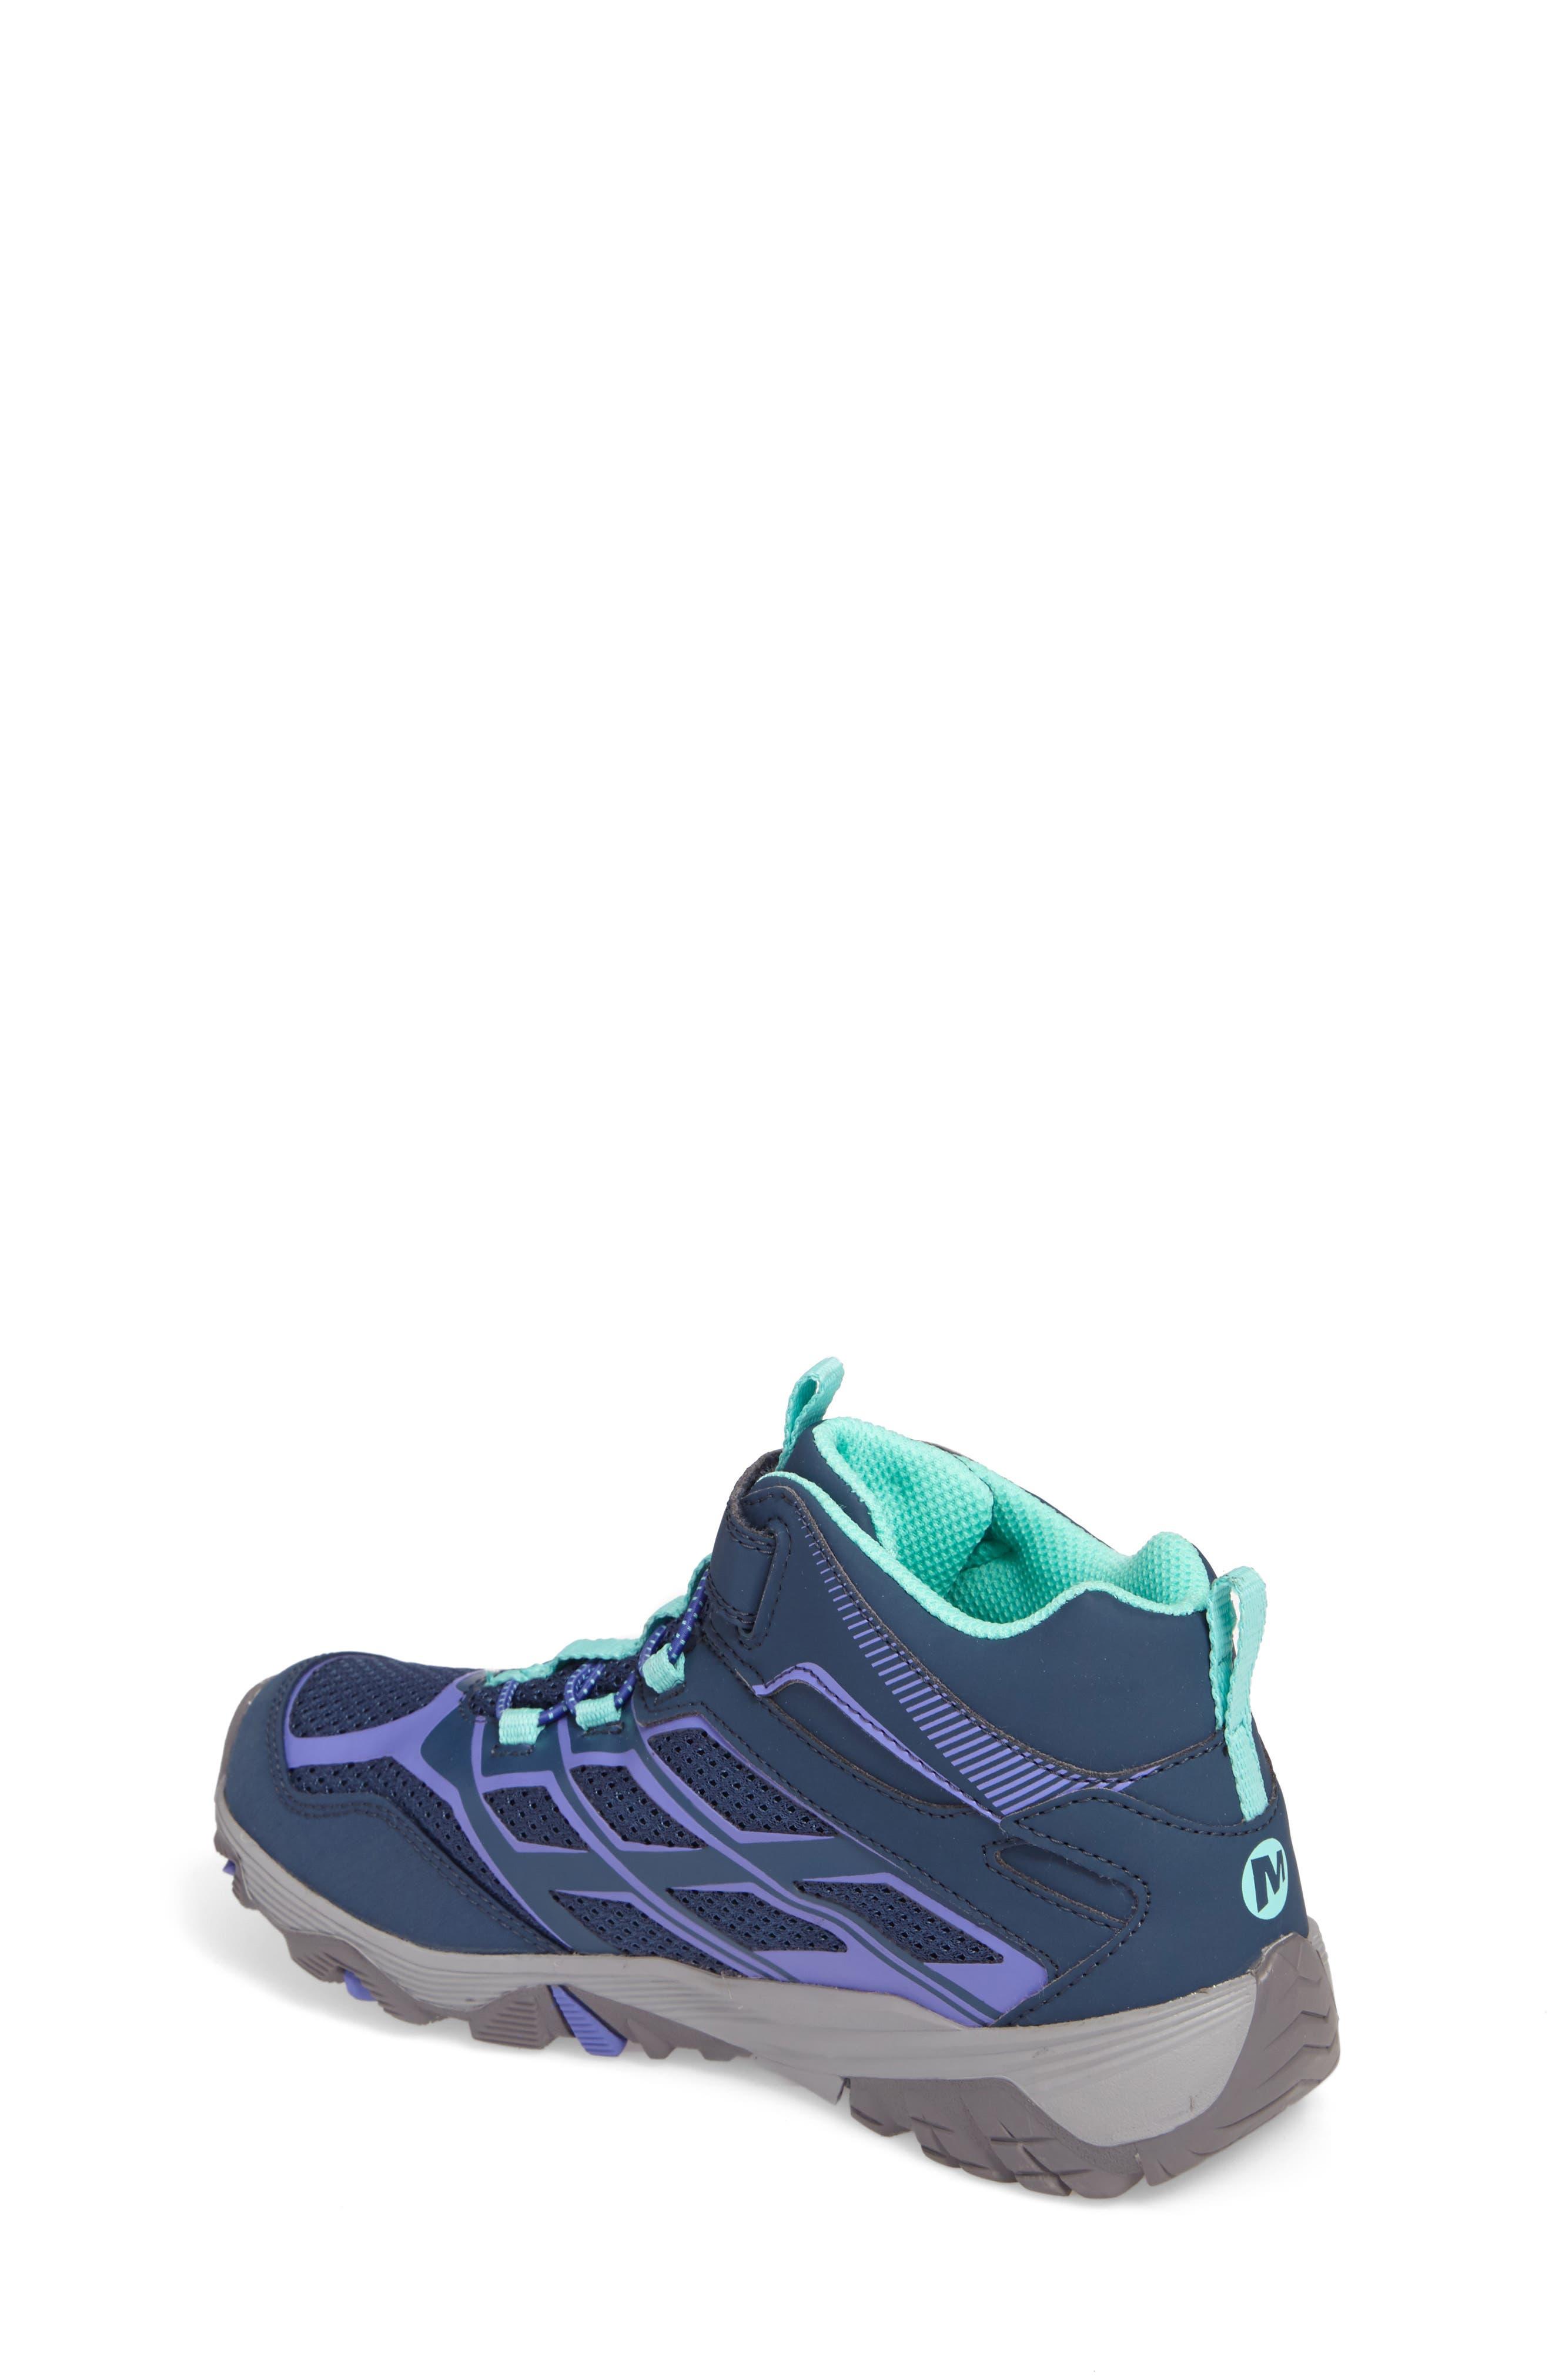 Alternate Image 2  - Merrell Moab FST Polar Mid Insulated Waterproof Sneaker Boot (Baby, Walker, Toddler, Little Kid & Big Kid)